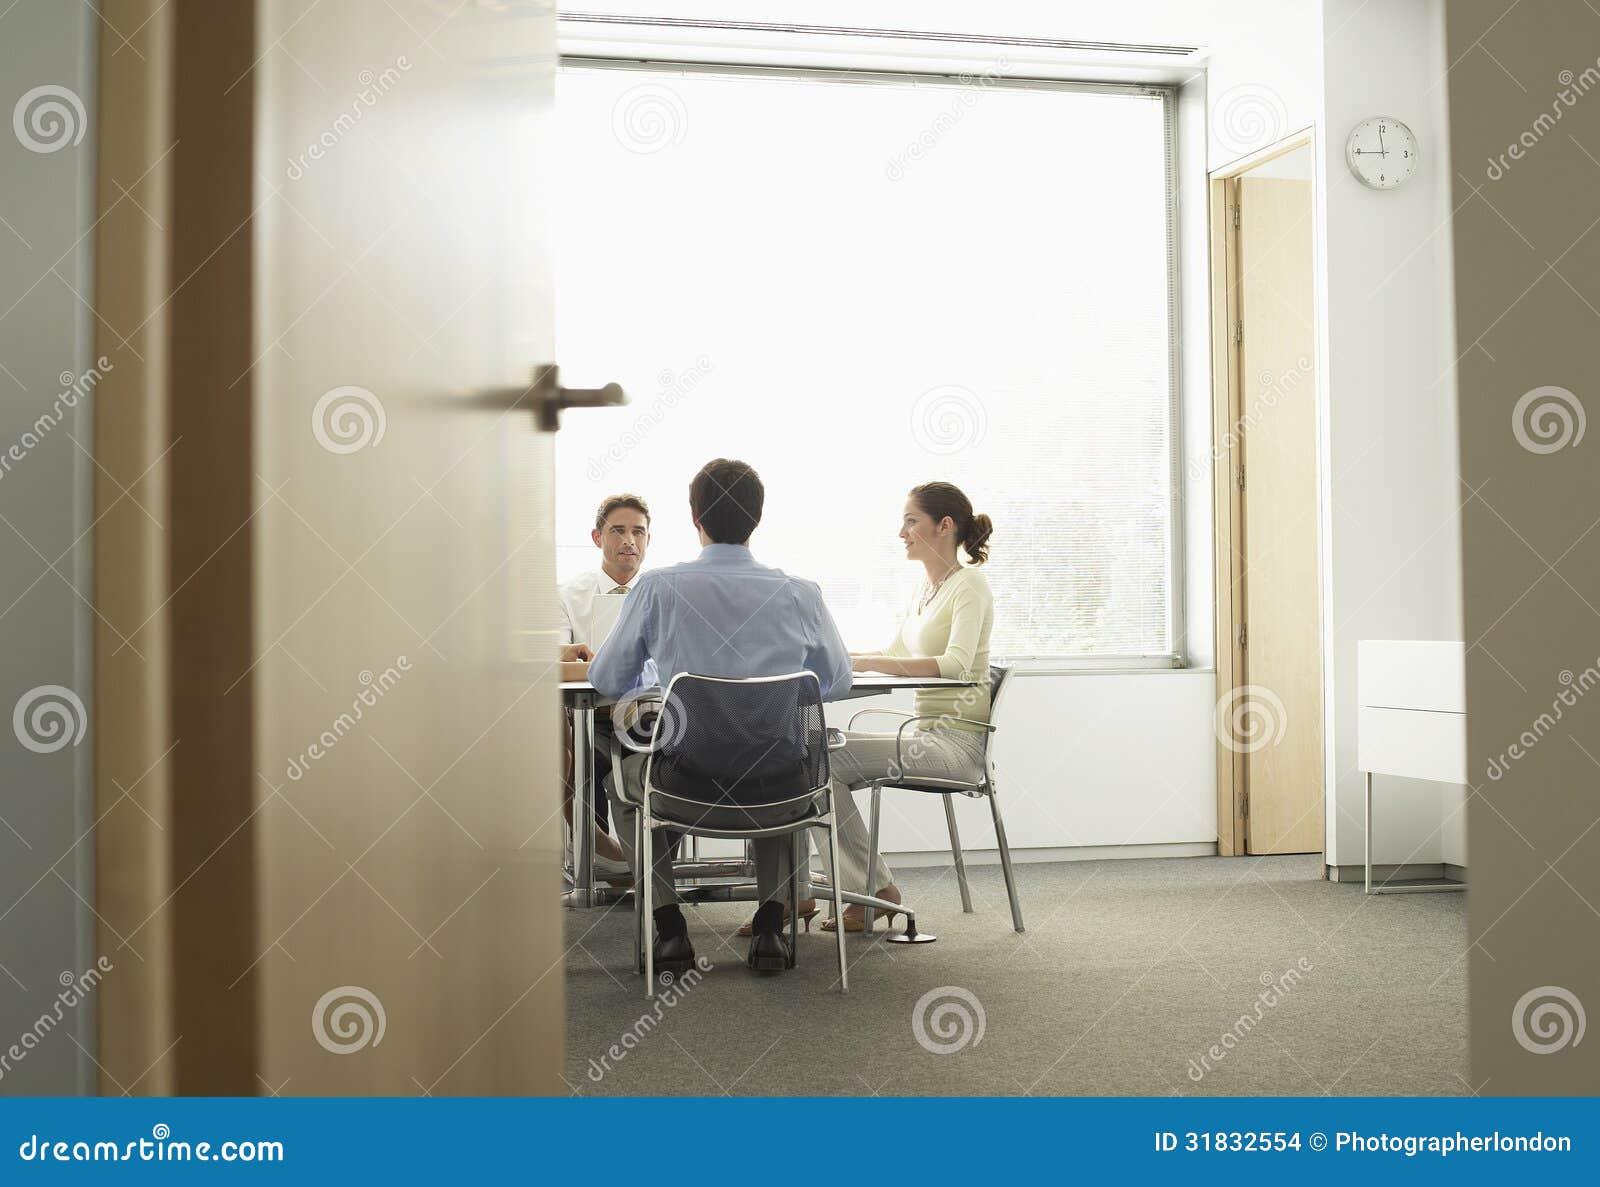 Businesspeople Having A Meeting In Boardroom